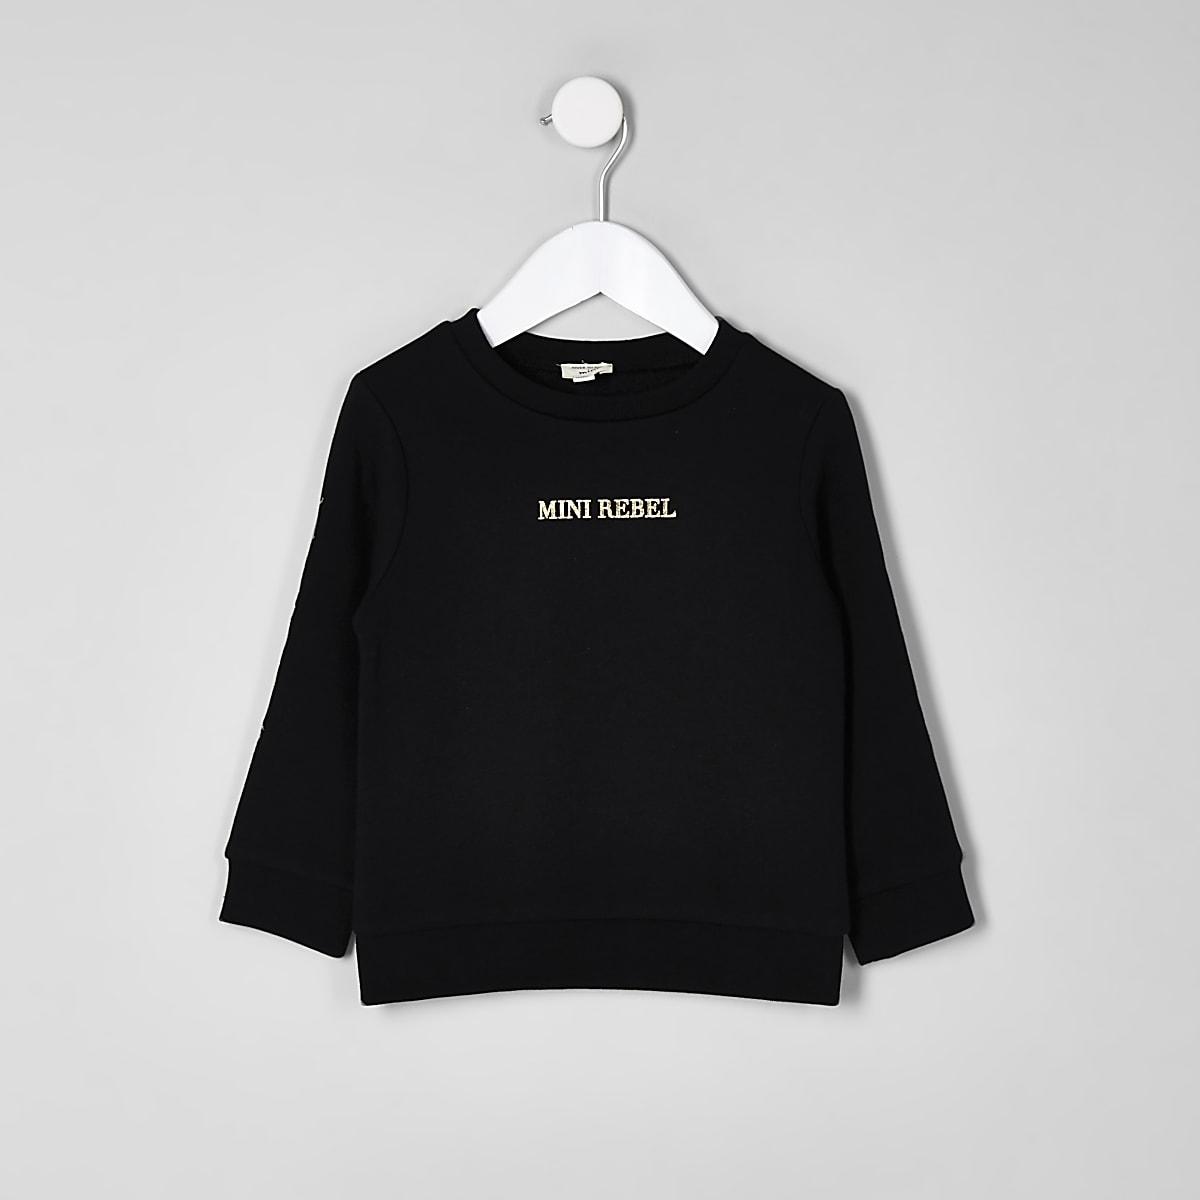 Mini boys black 'rebel' sweatshirt